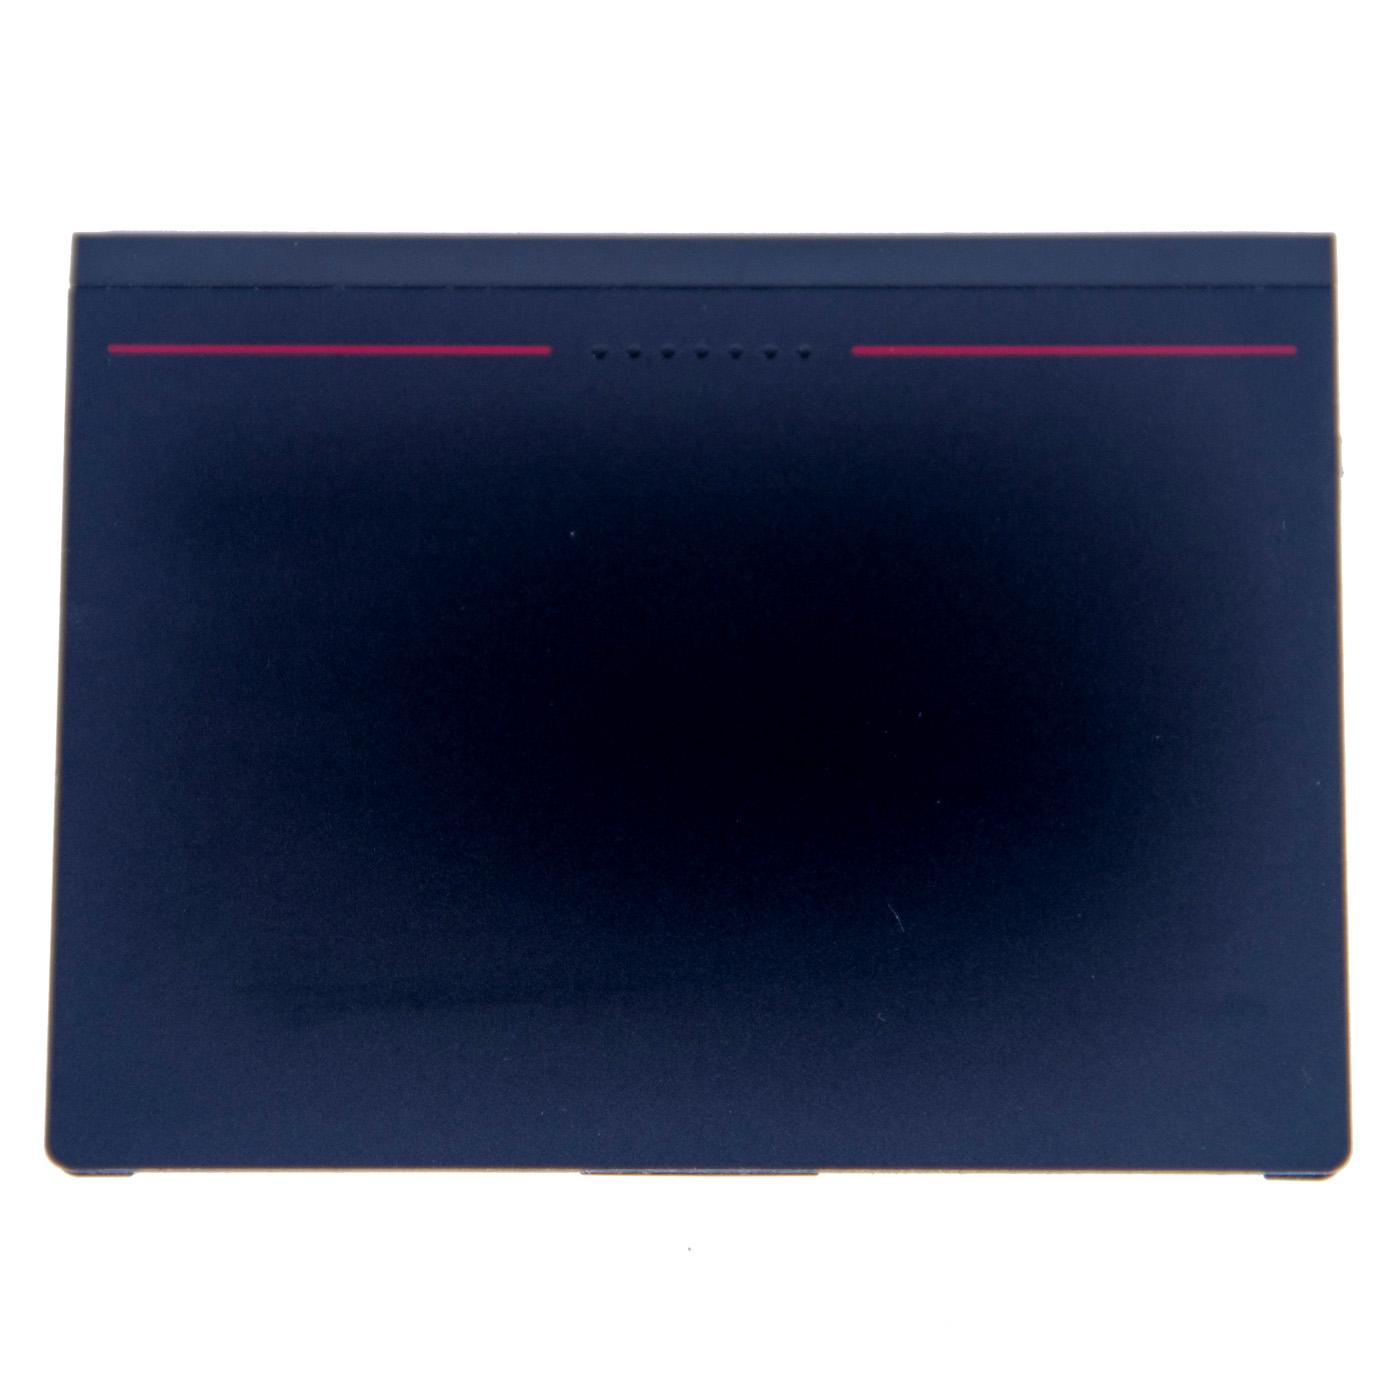 Touchpad Lenovo ThinkPad S540 T540p W540 T440s T440p T440